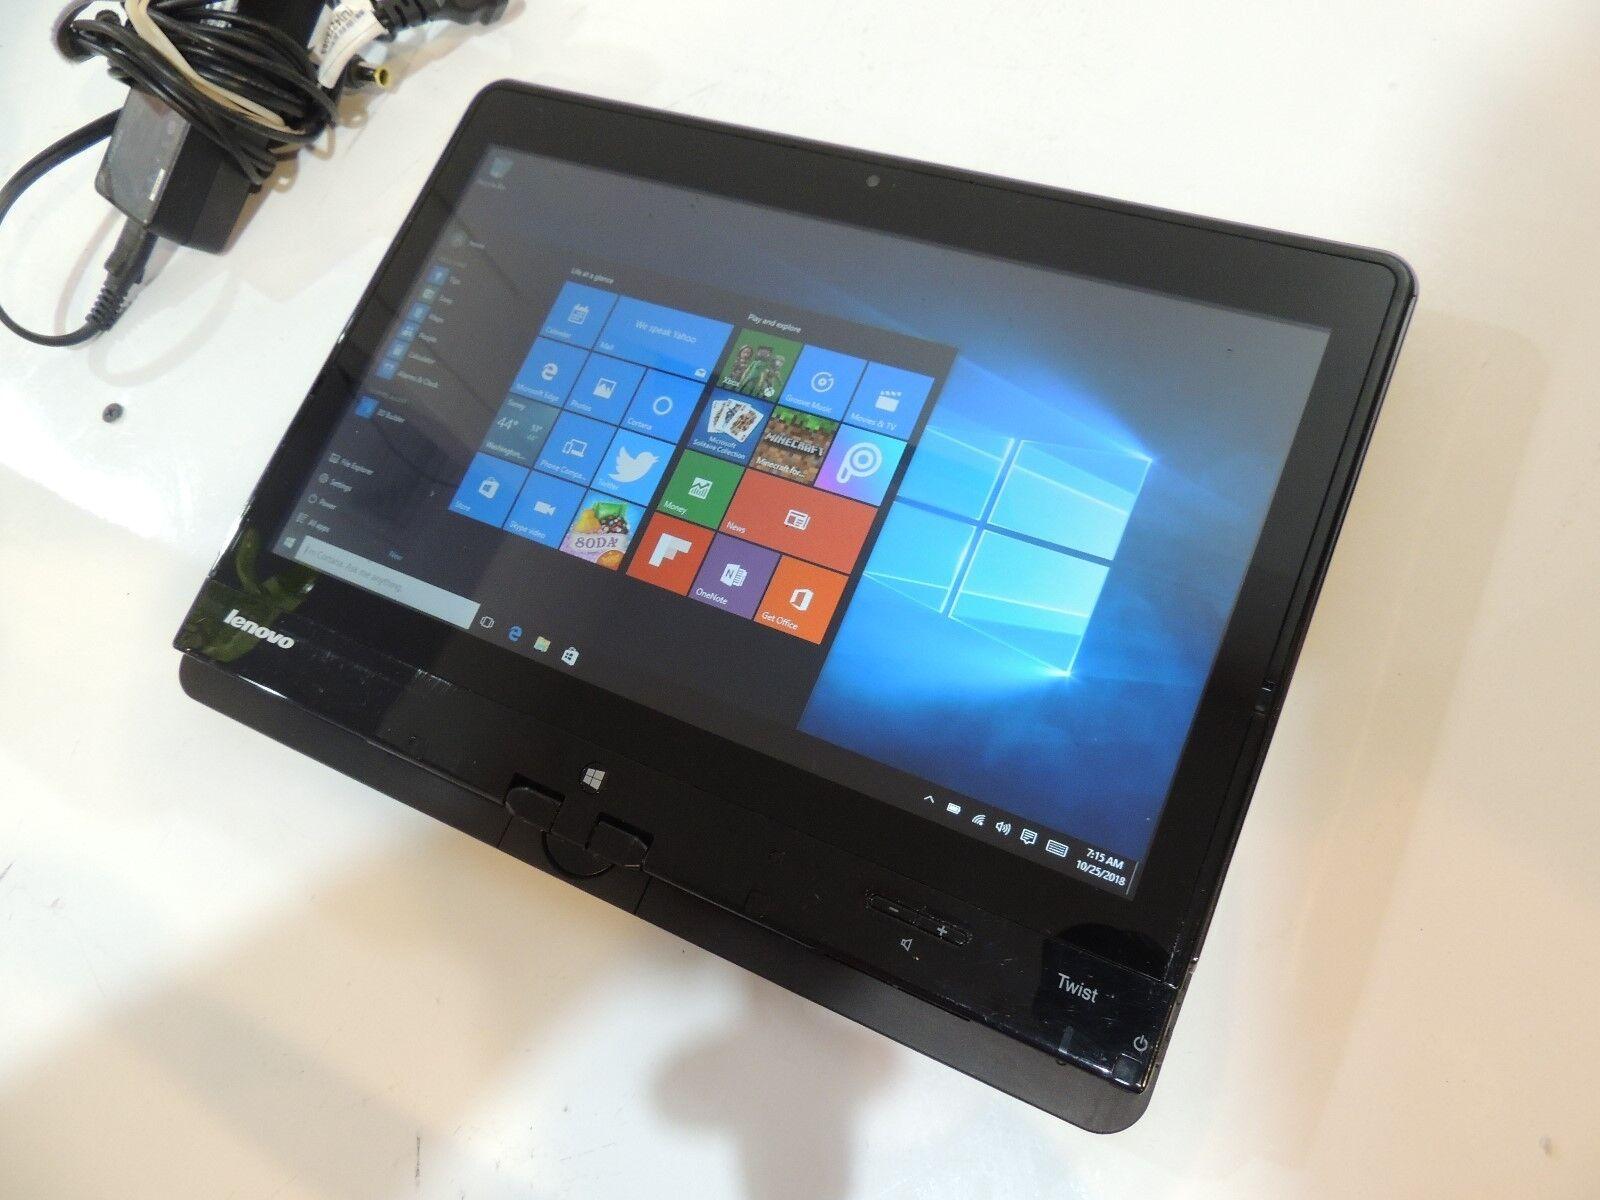 Laptop Windows - Lenovo Twist S230u 12.5 Touchscreen tablet laptop  CORe i3 4GB RAM Windows 10